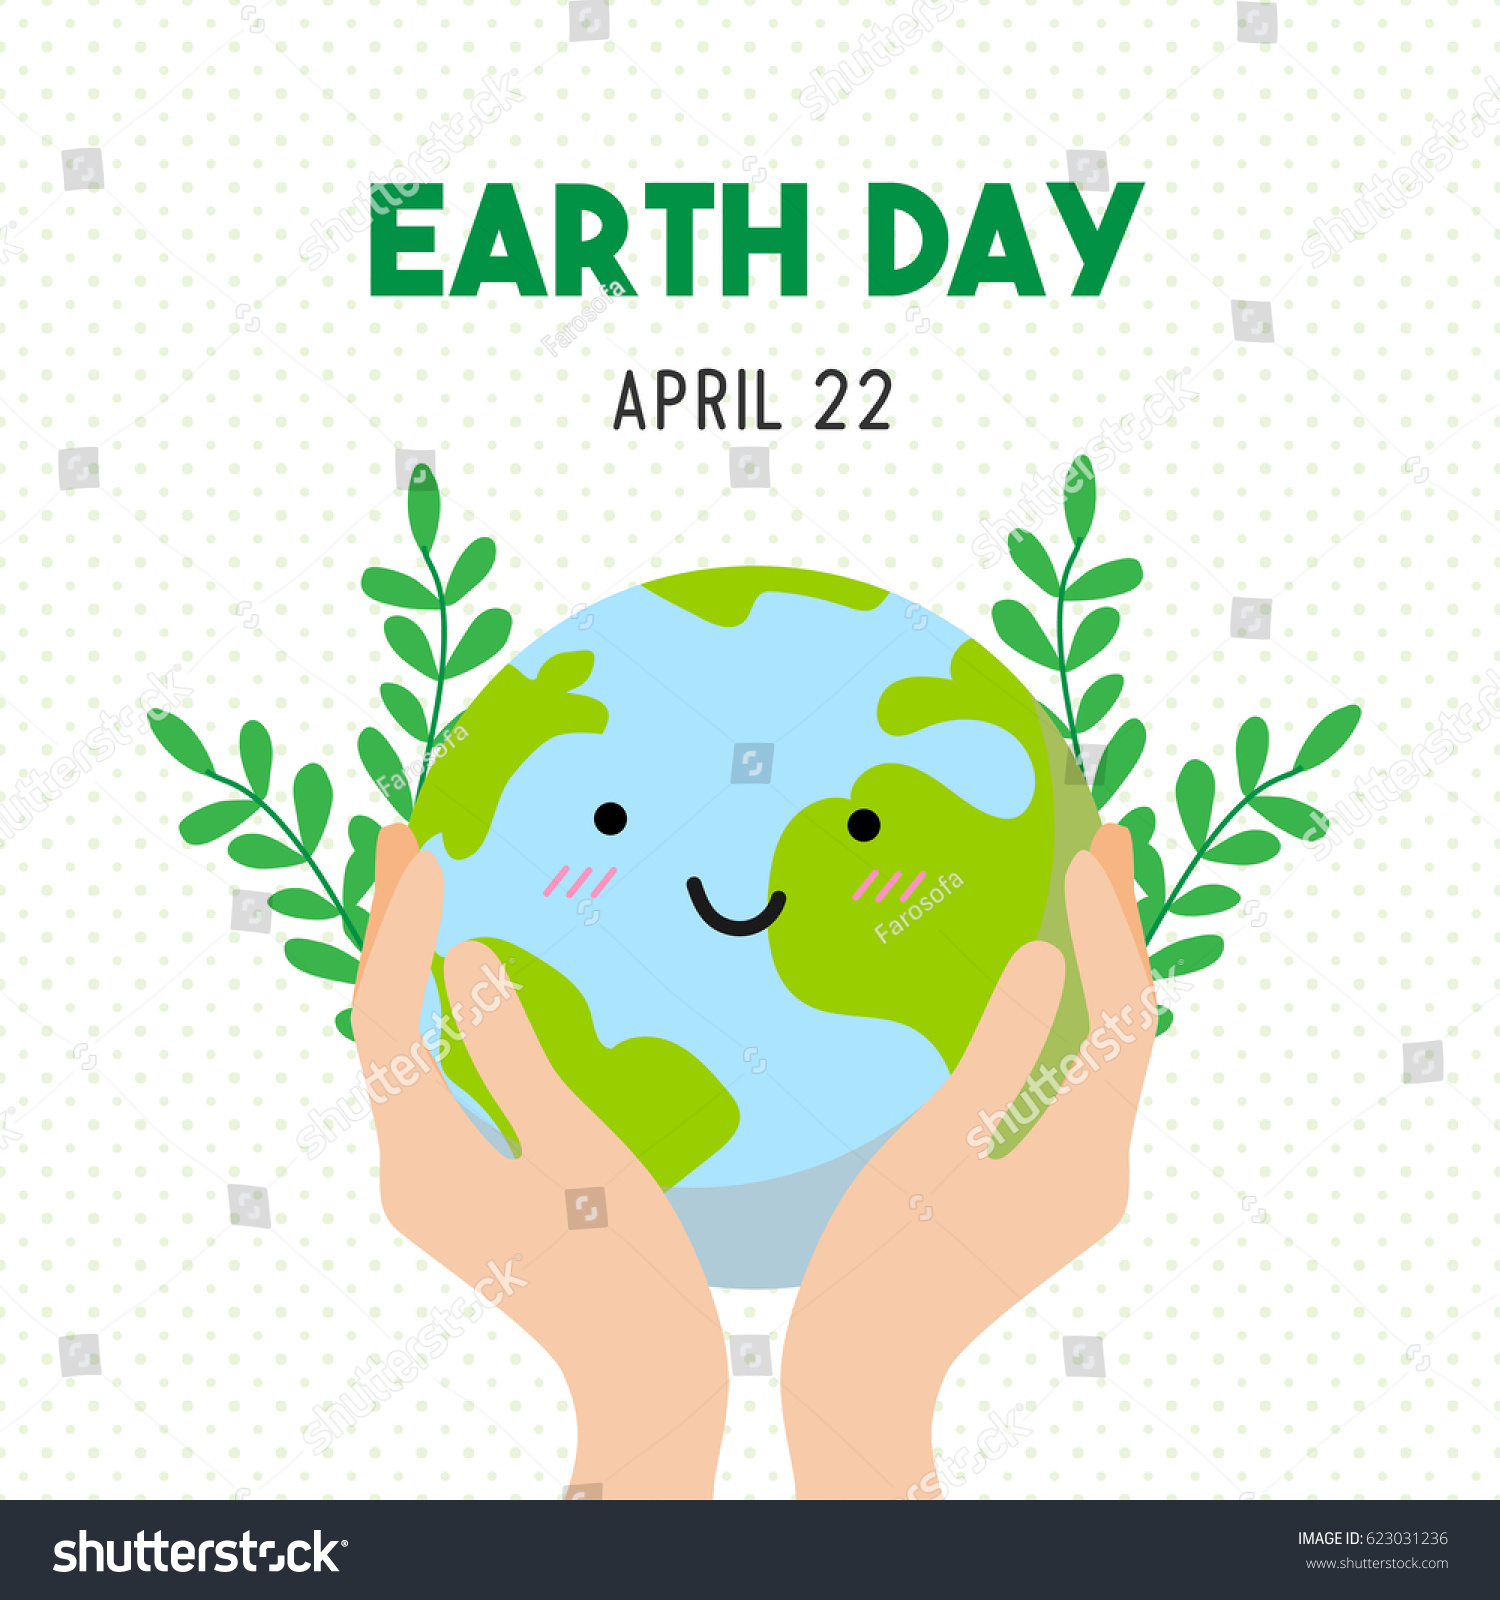 Earth Day Cartoon Card Earth Day Stock Vector (Royalty Free) 623031236